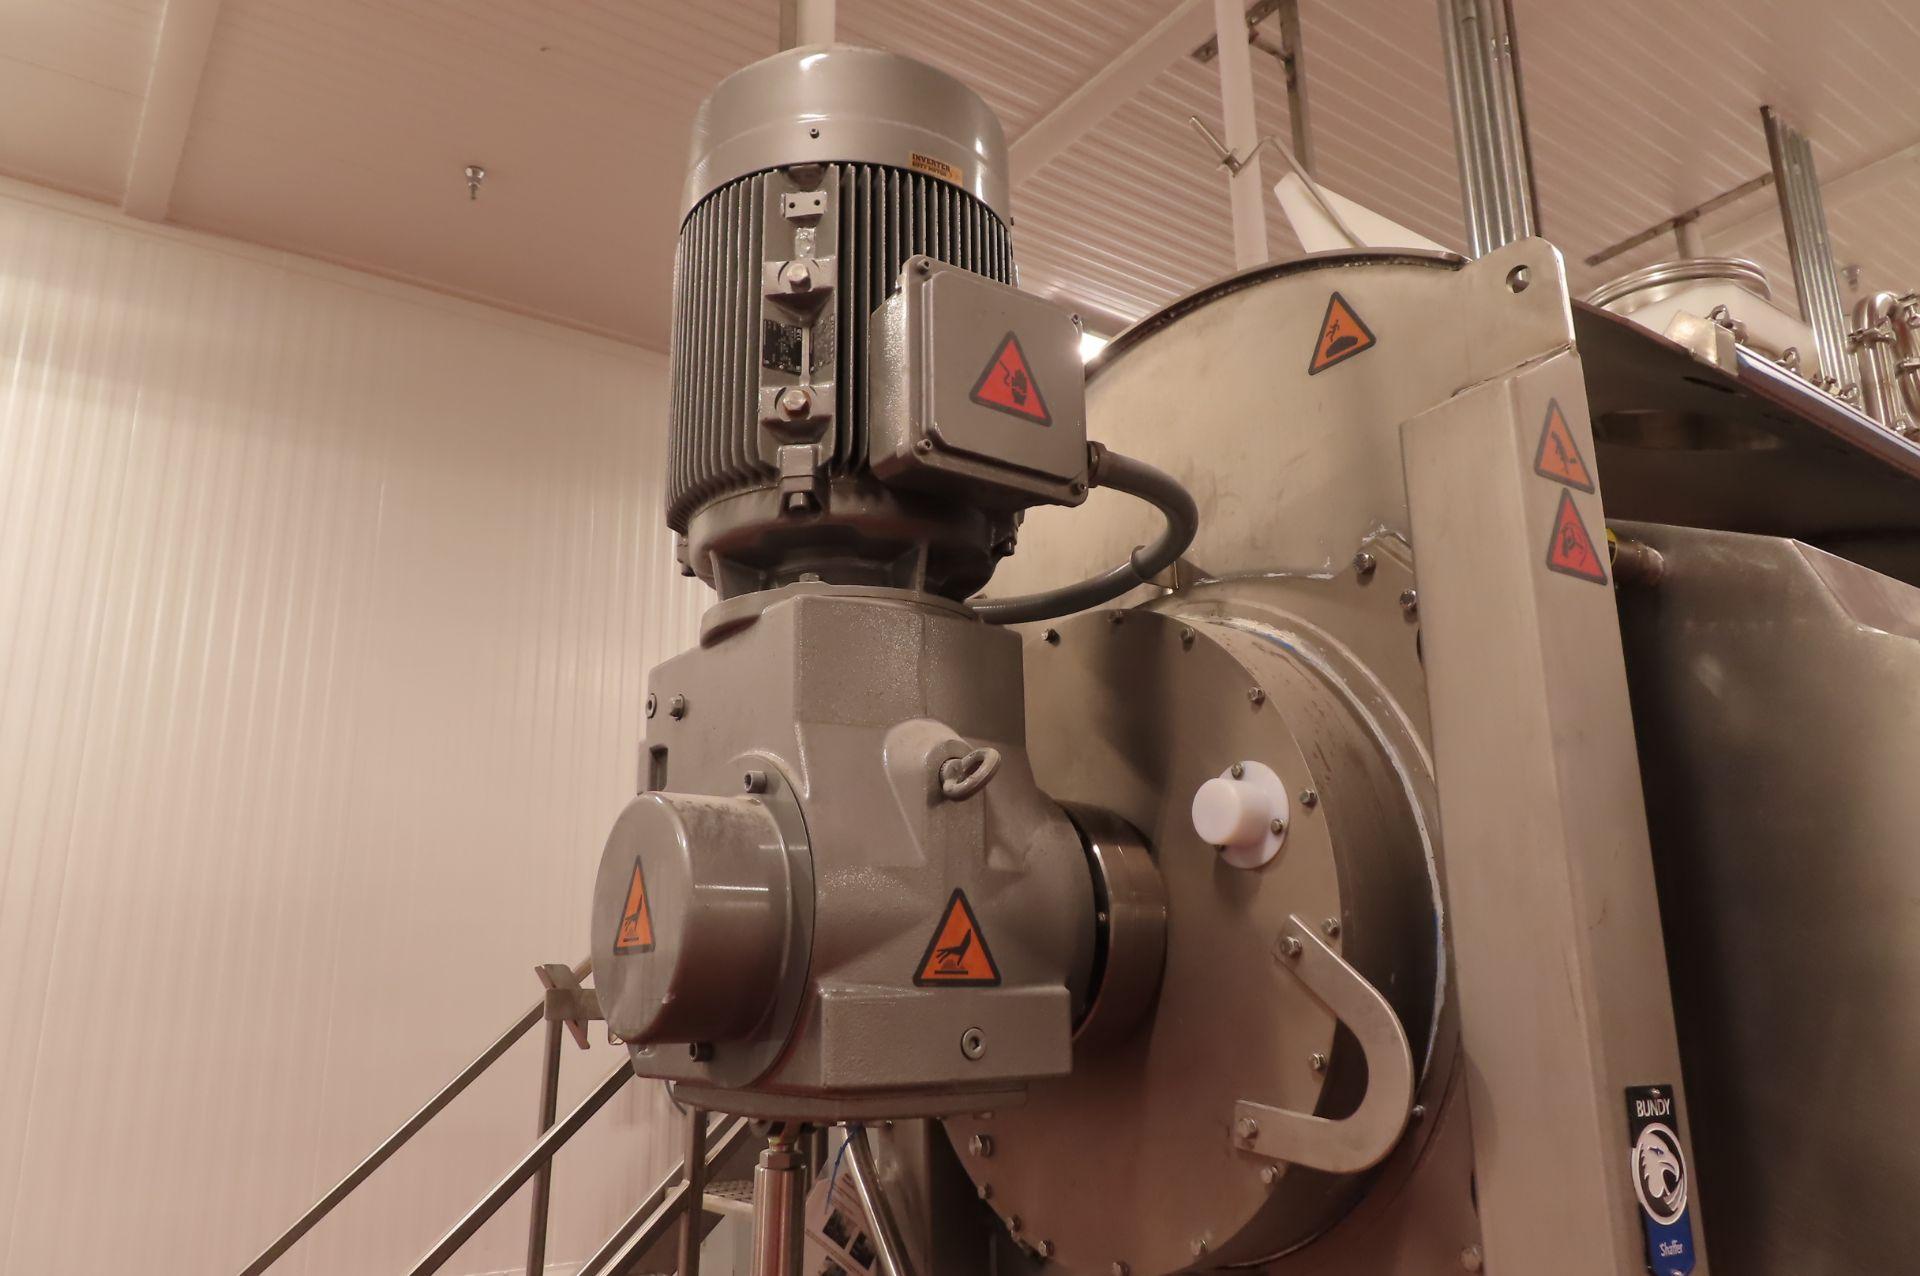 Sigma Arm Mixer #1 - Image 4 of 11